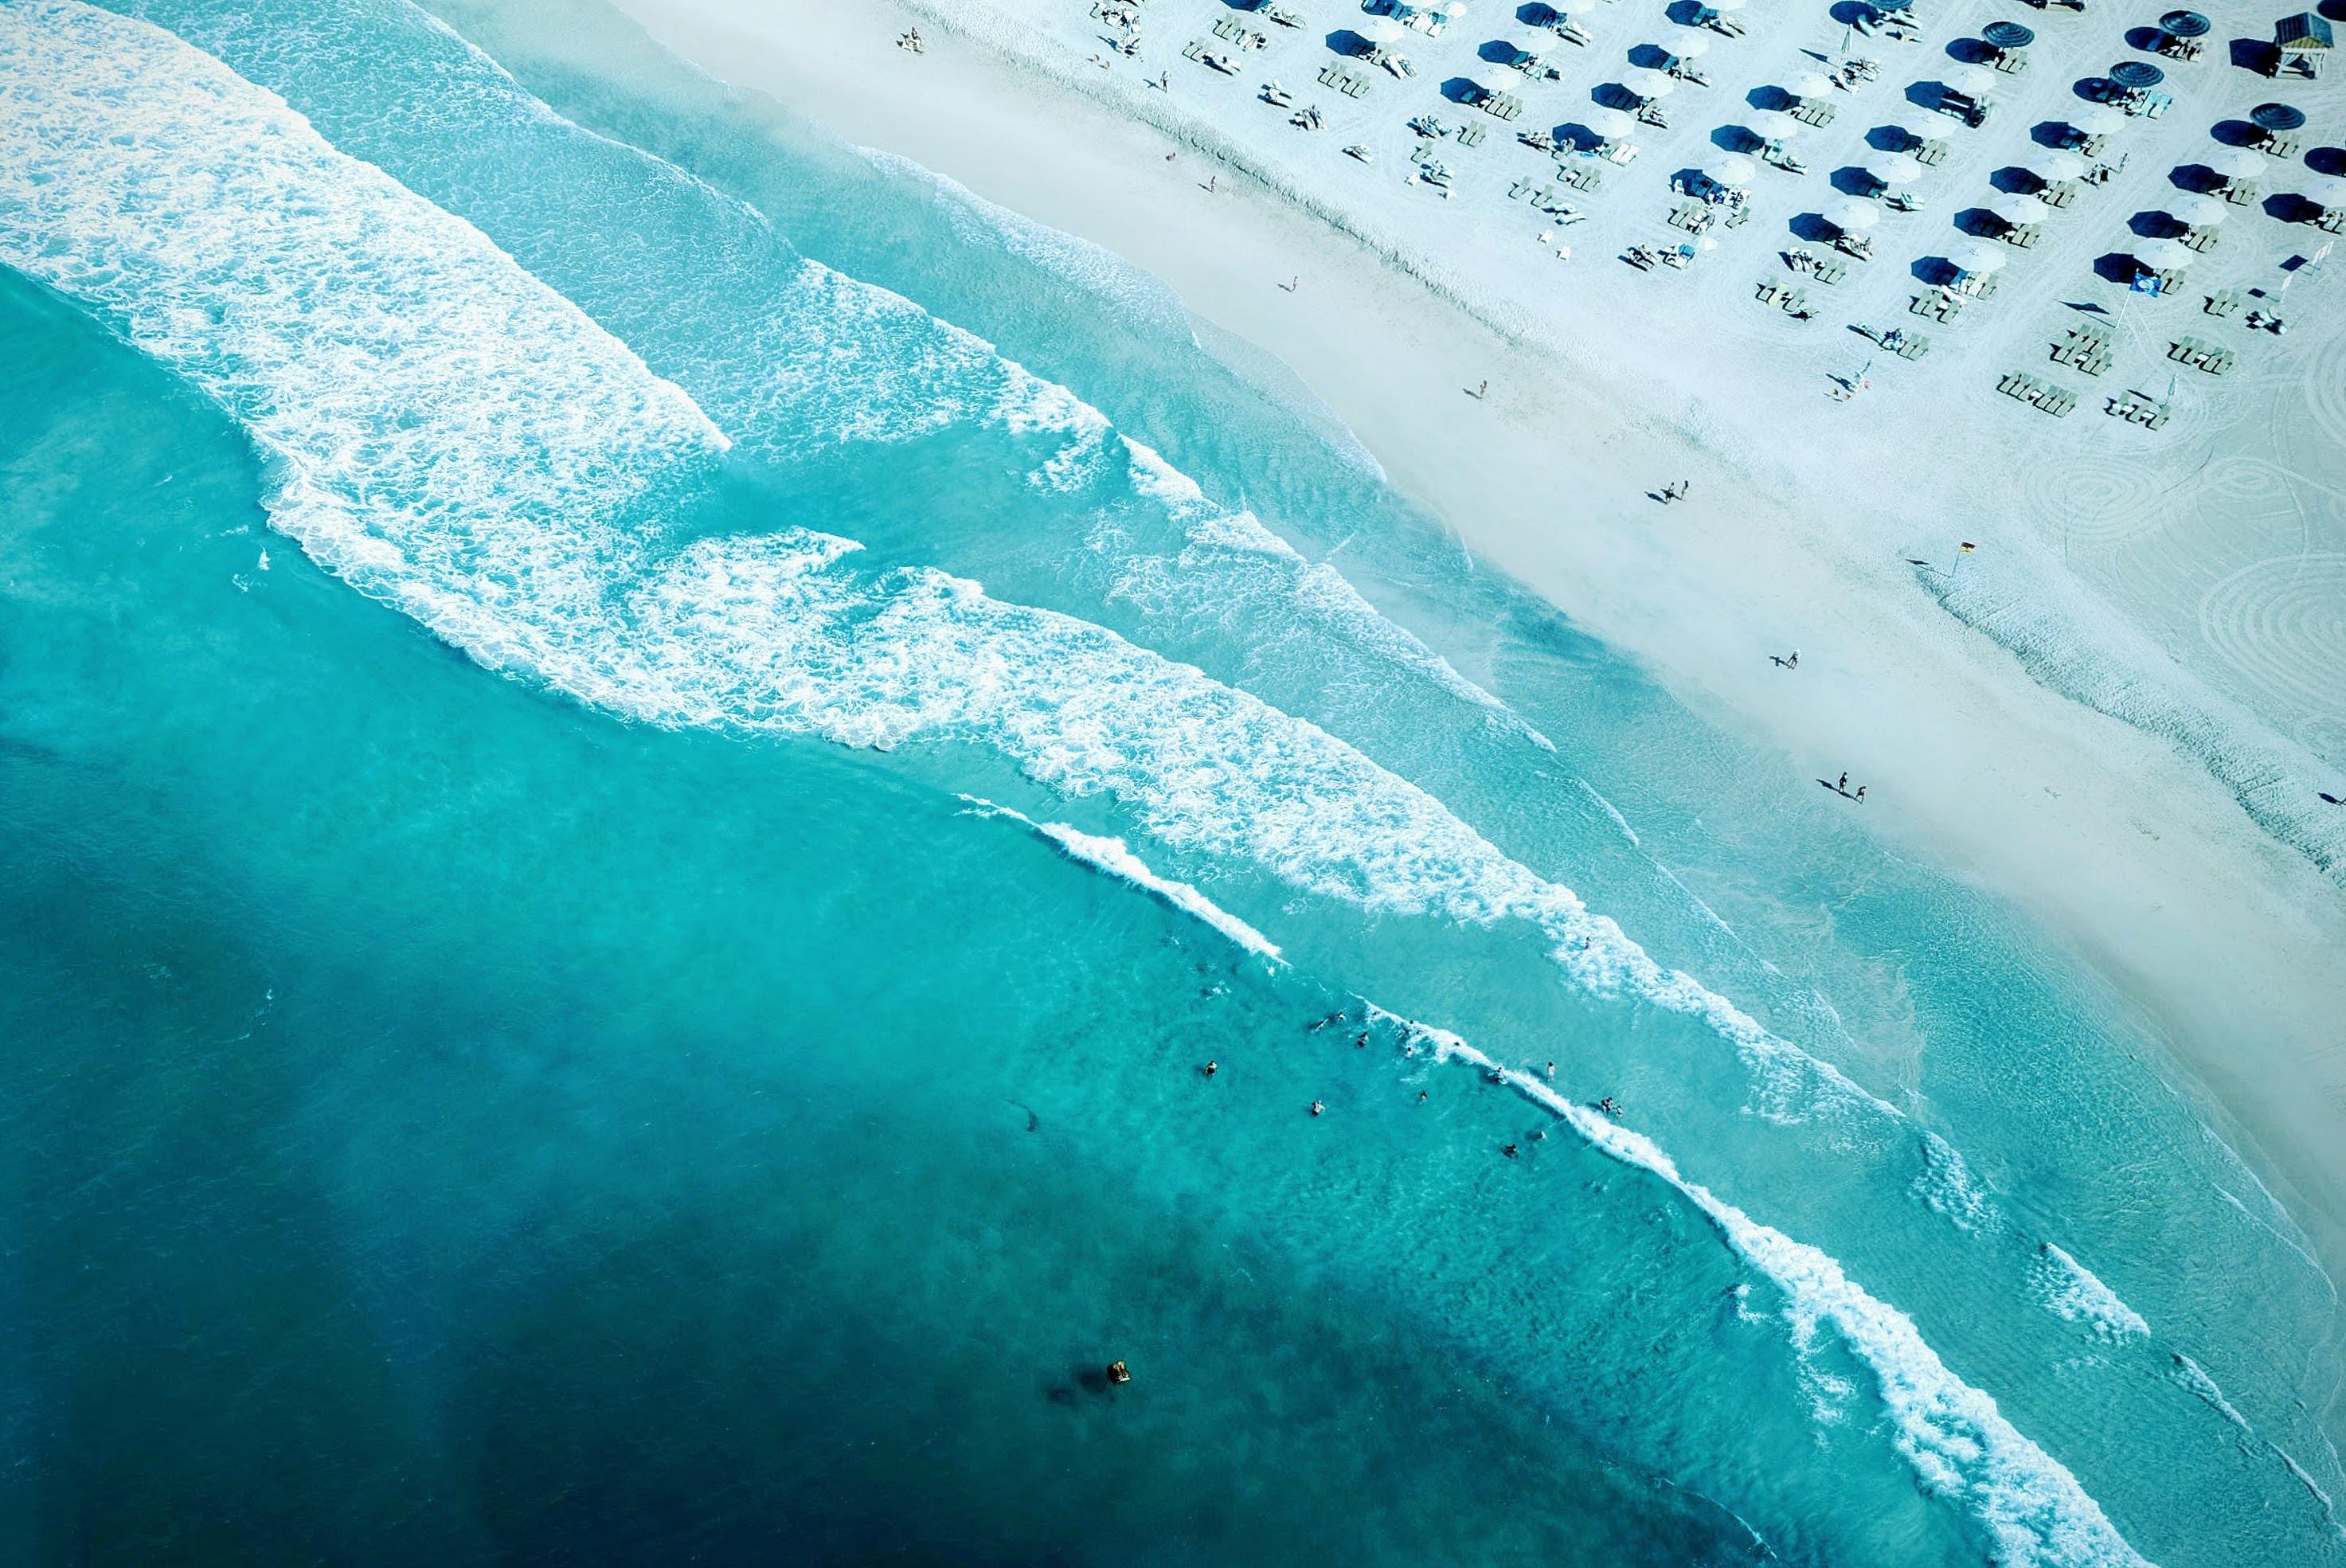 Clear blue ocean tide waves washing into sanding beach in Dubai